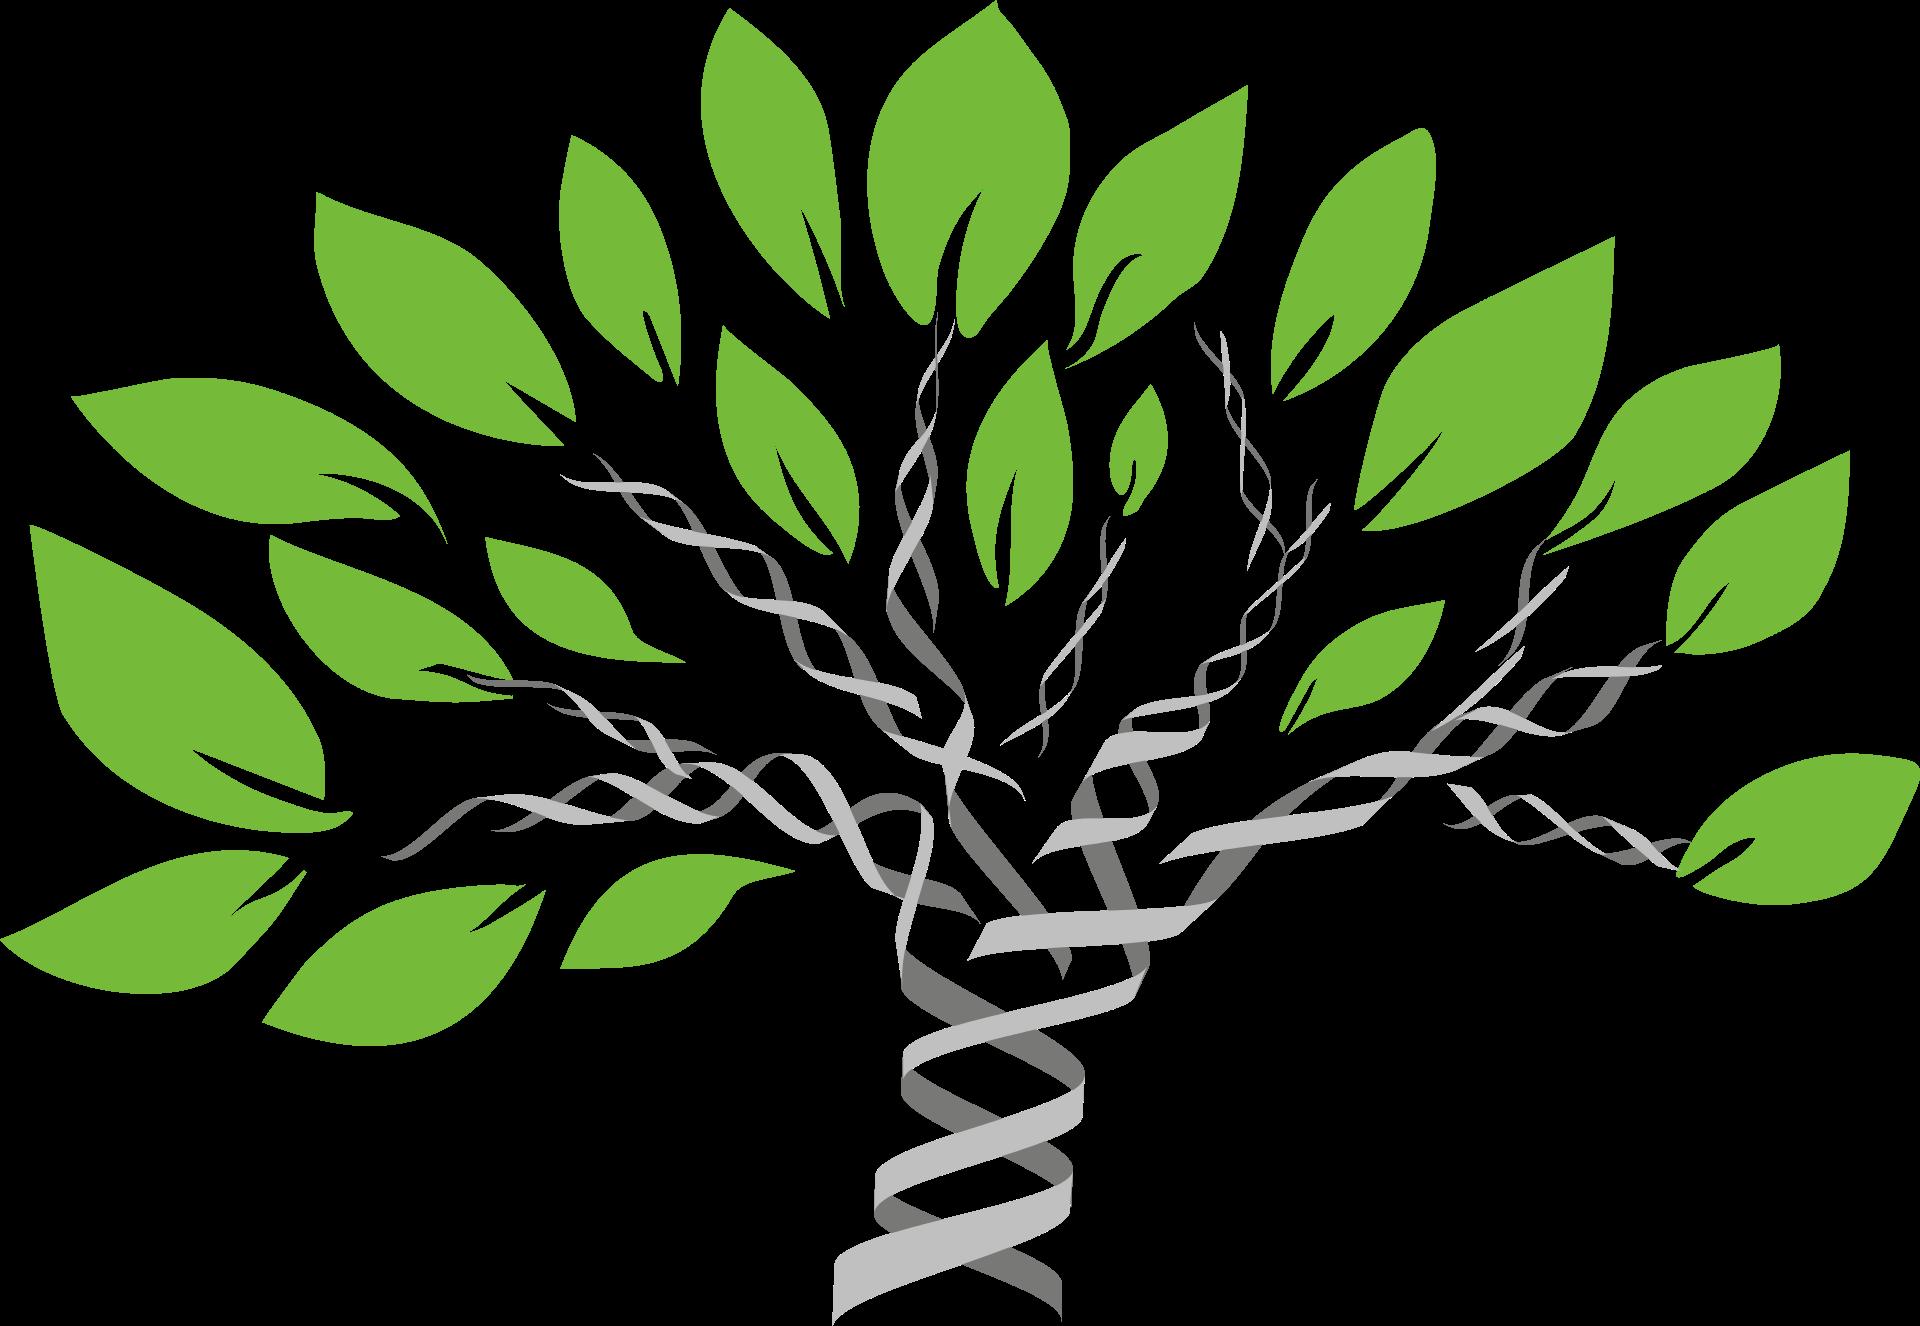 gene-tree-1490270